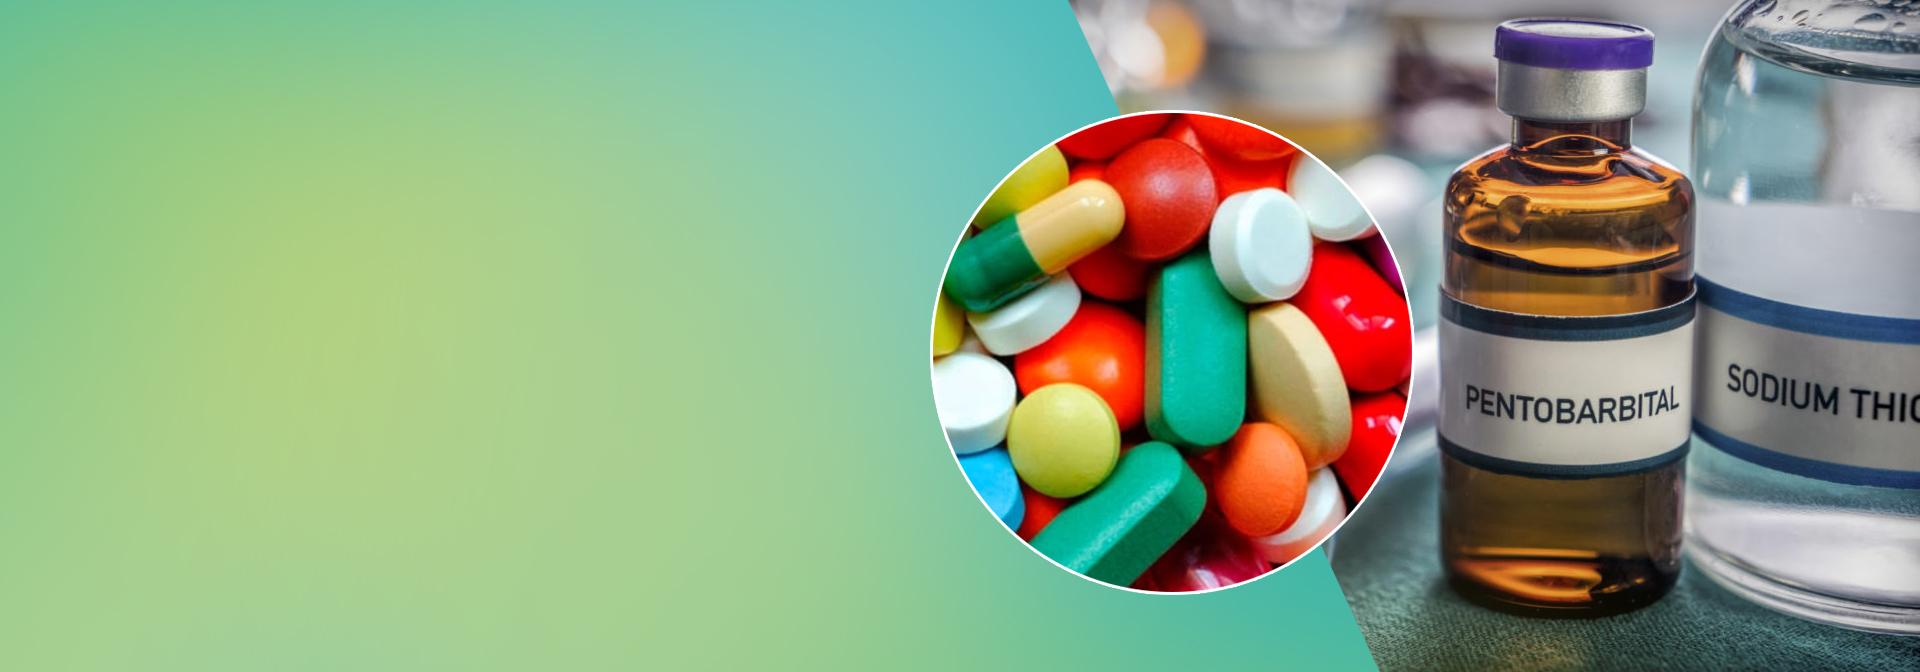 Nembutal Tablets